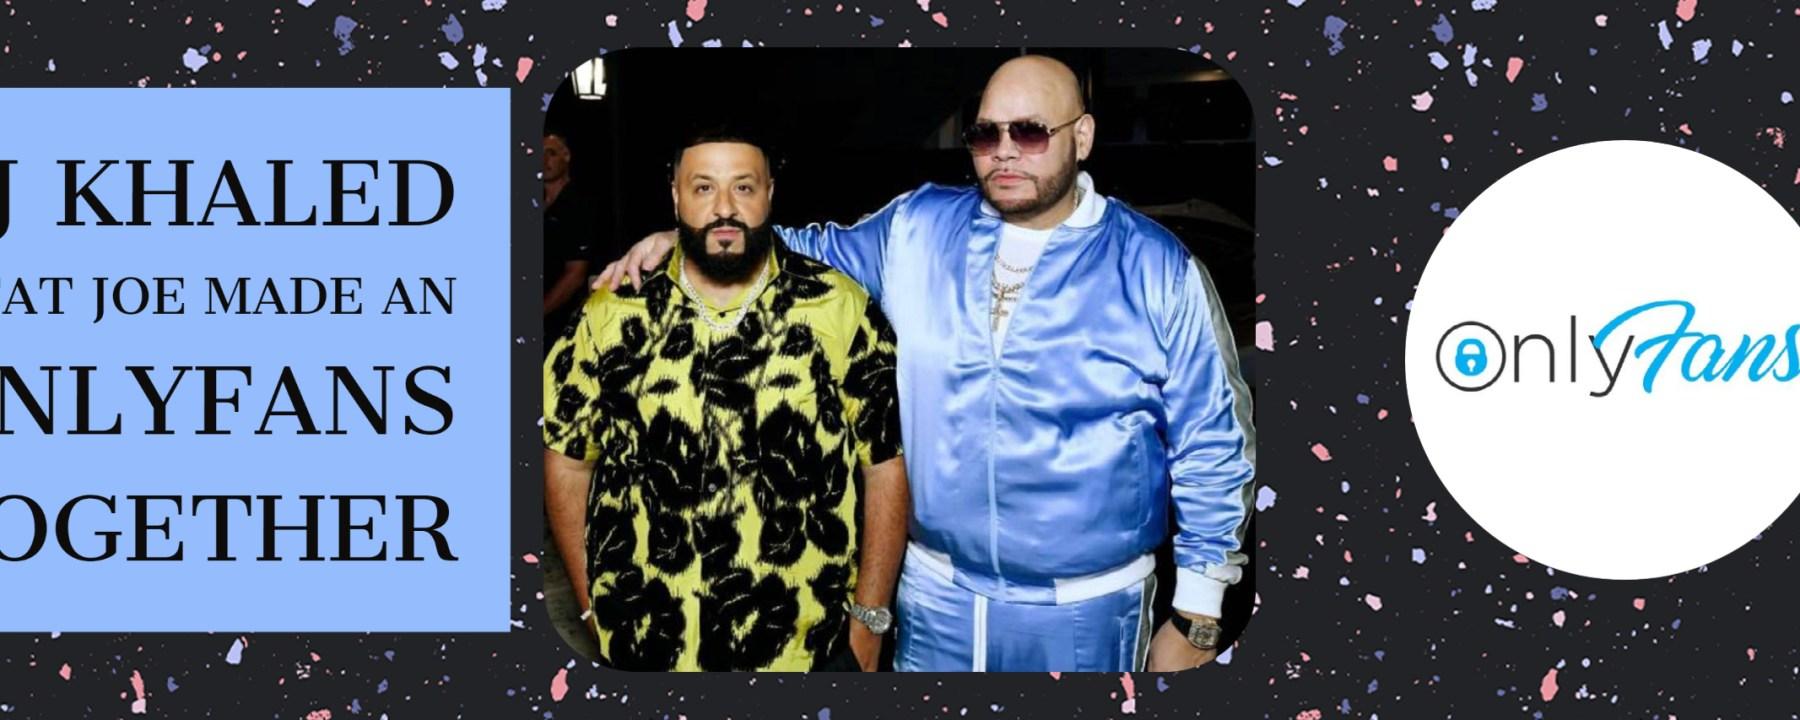 dj khaled and fat joe onlyfans